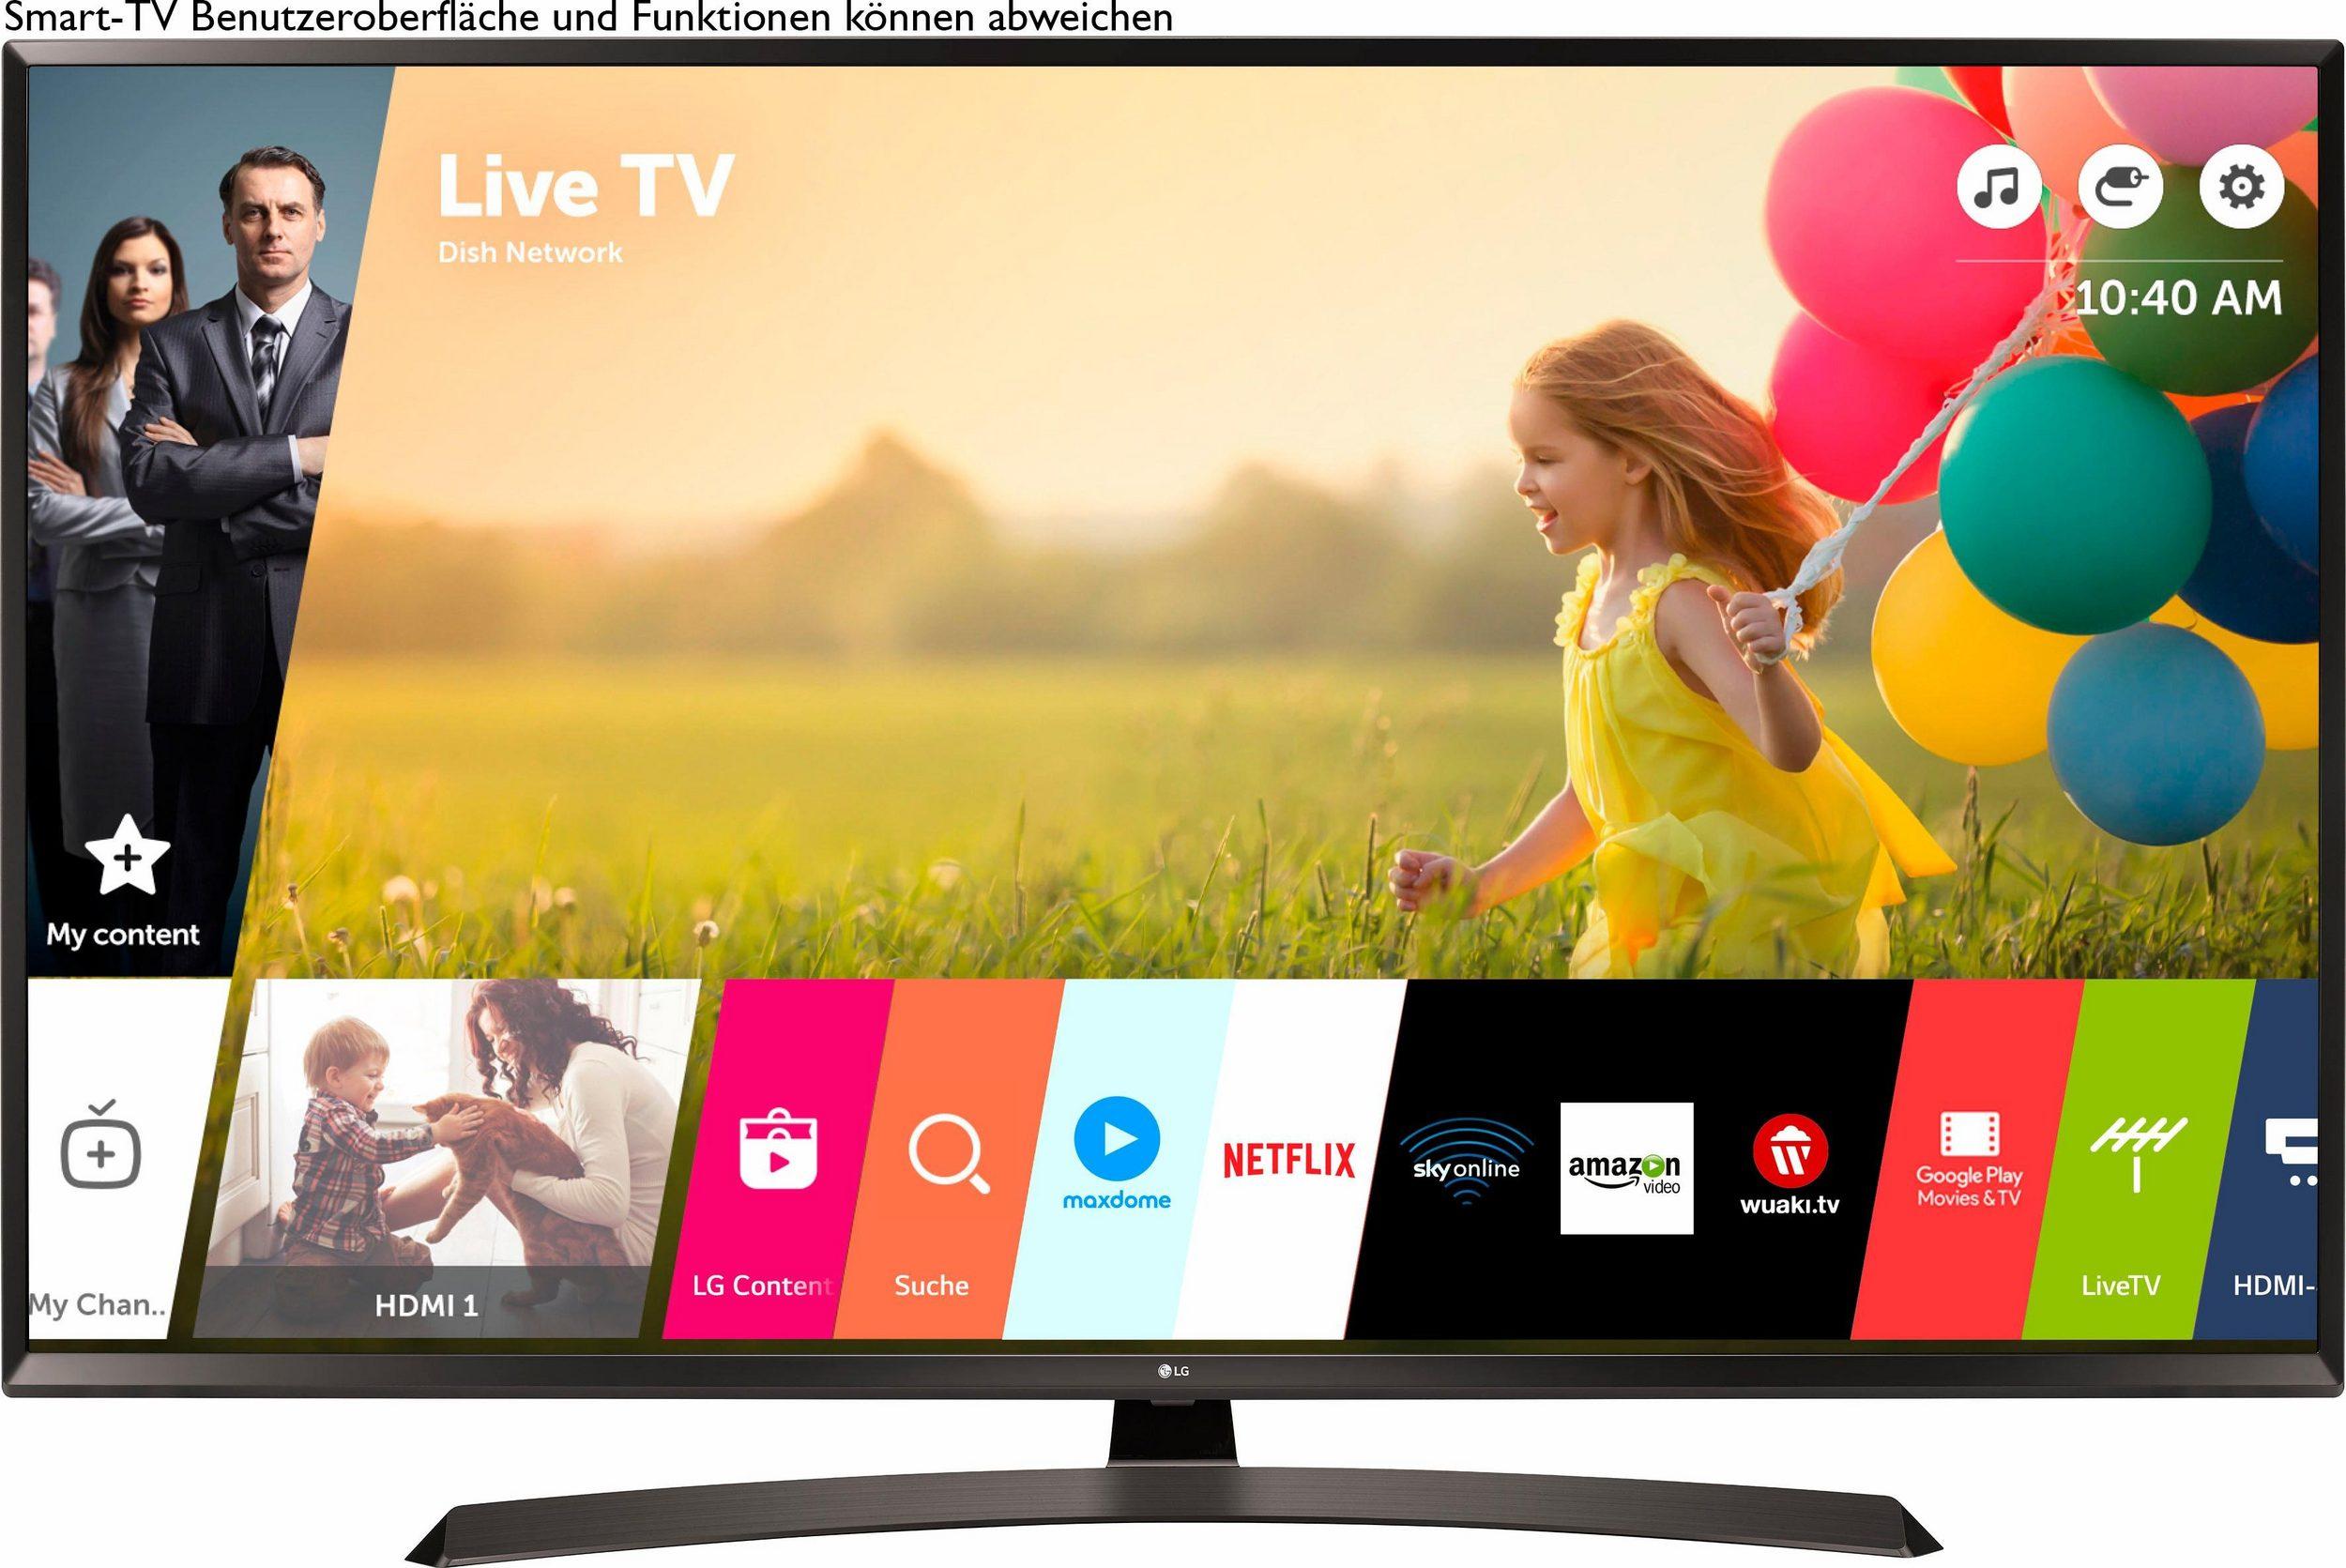 [Lokal Medimax Mundsburg] LG 65UJ634V | 65 Zoll / 164cm (65'' UHD, HDR10+HLG(8-Bit+FRC), Smart TV, webOS, USB-Recording, HbbTV, Integrierter Triple Tuner (DVB-T2 HD/S2/C), PMI 1600, WLAN, DLNA, 3x HDMI, 2x USB, CI+ Modul-Schacht)